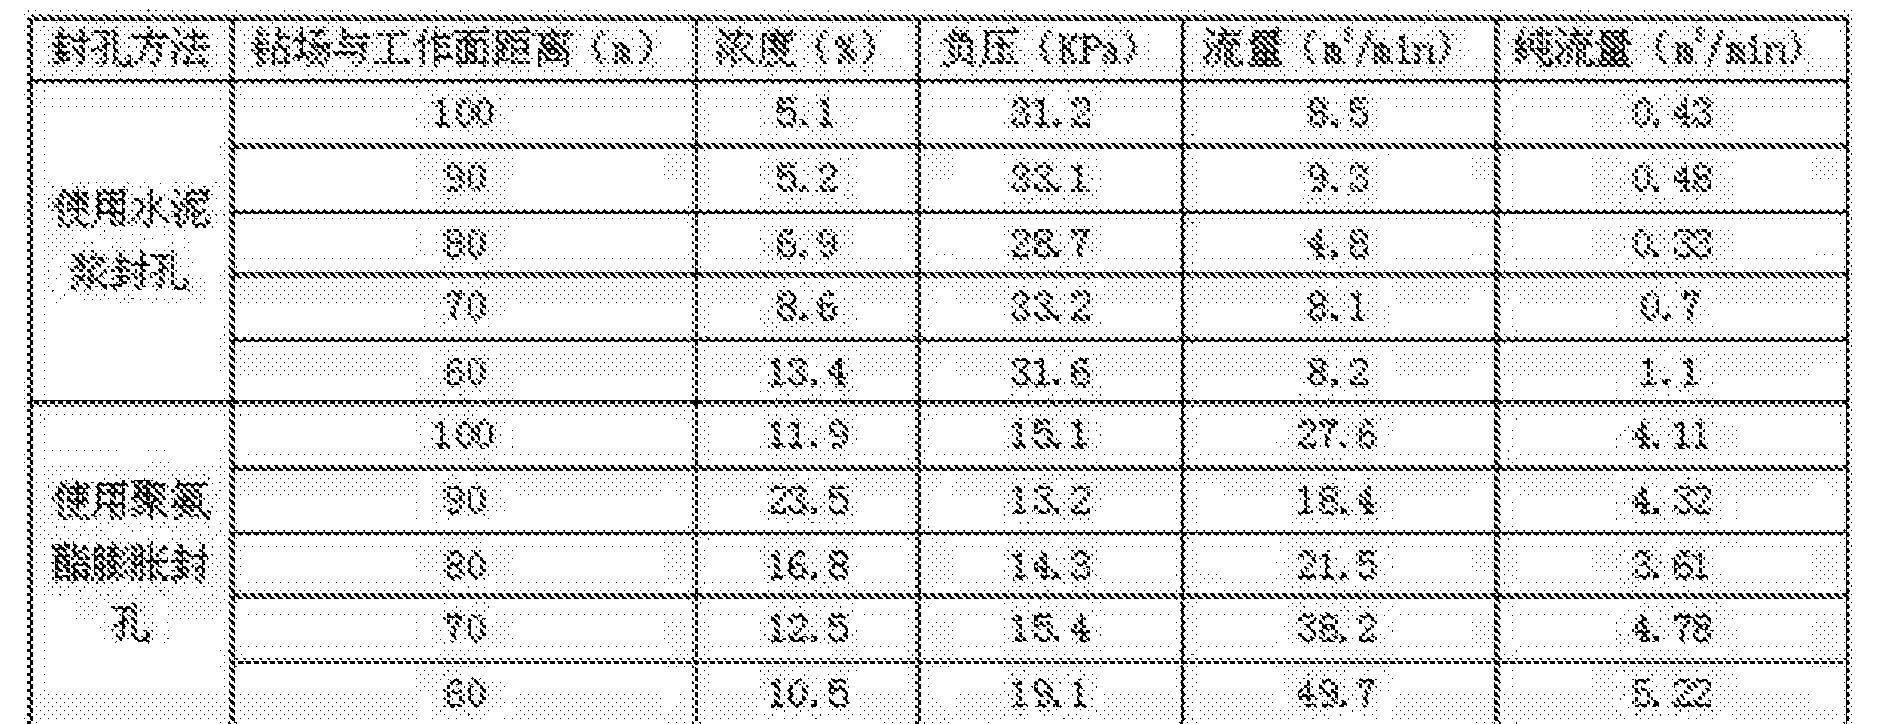 Figure CN205477518UD00061